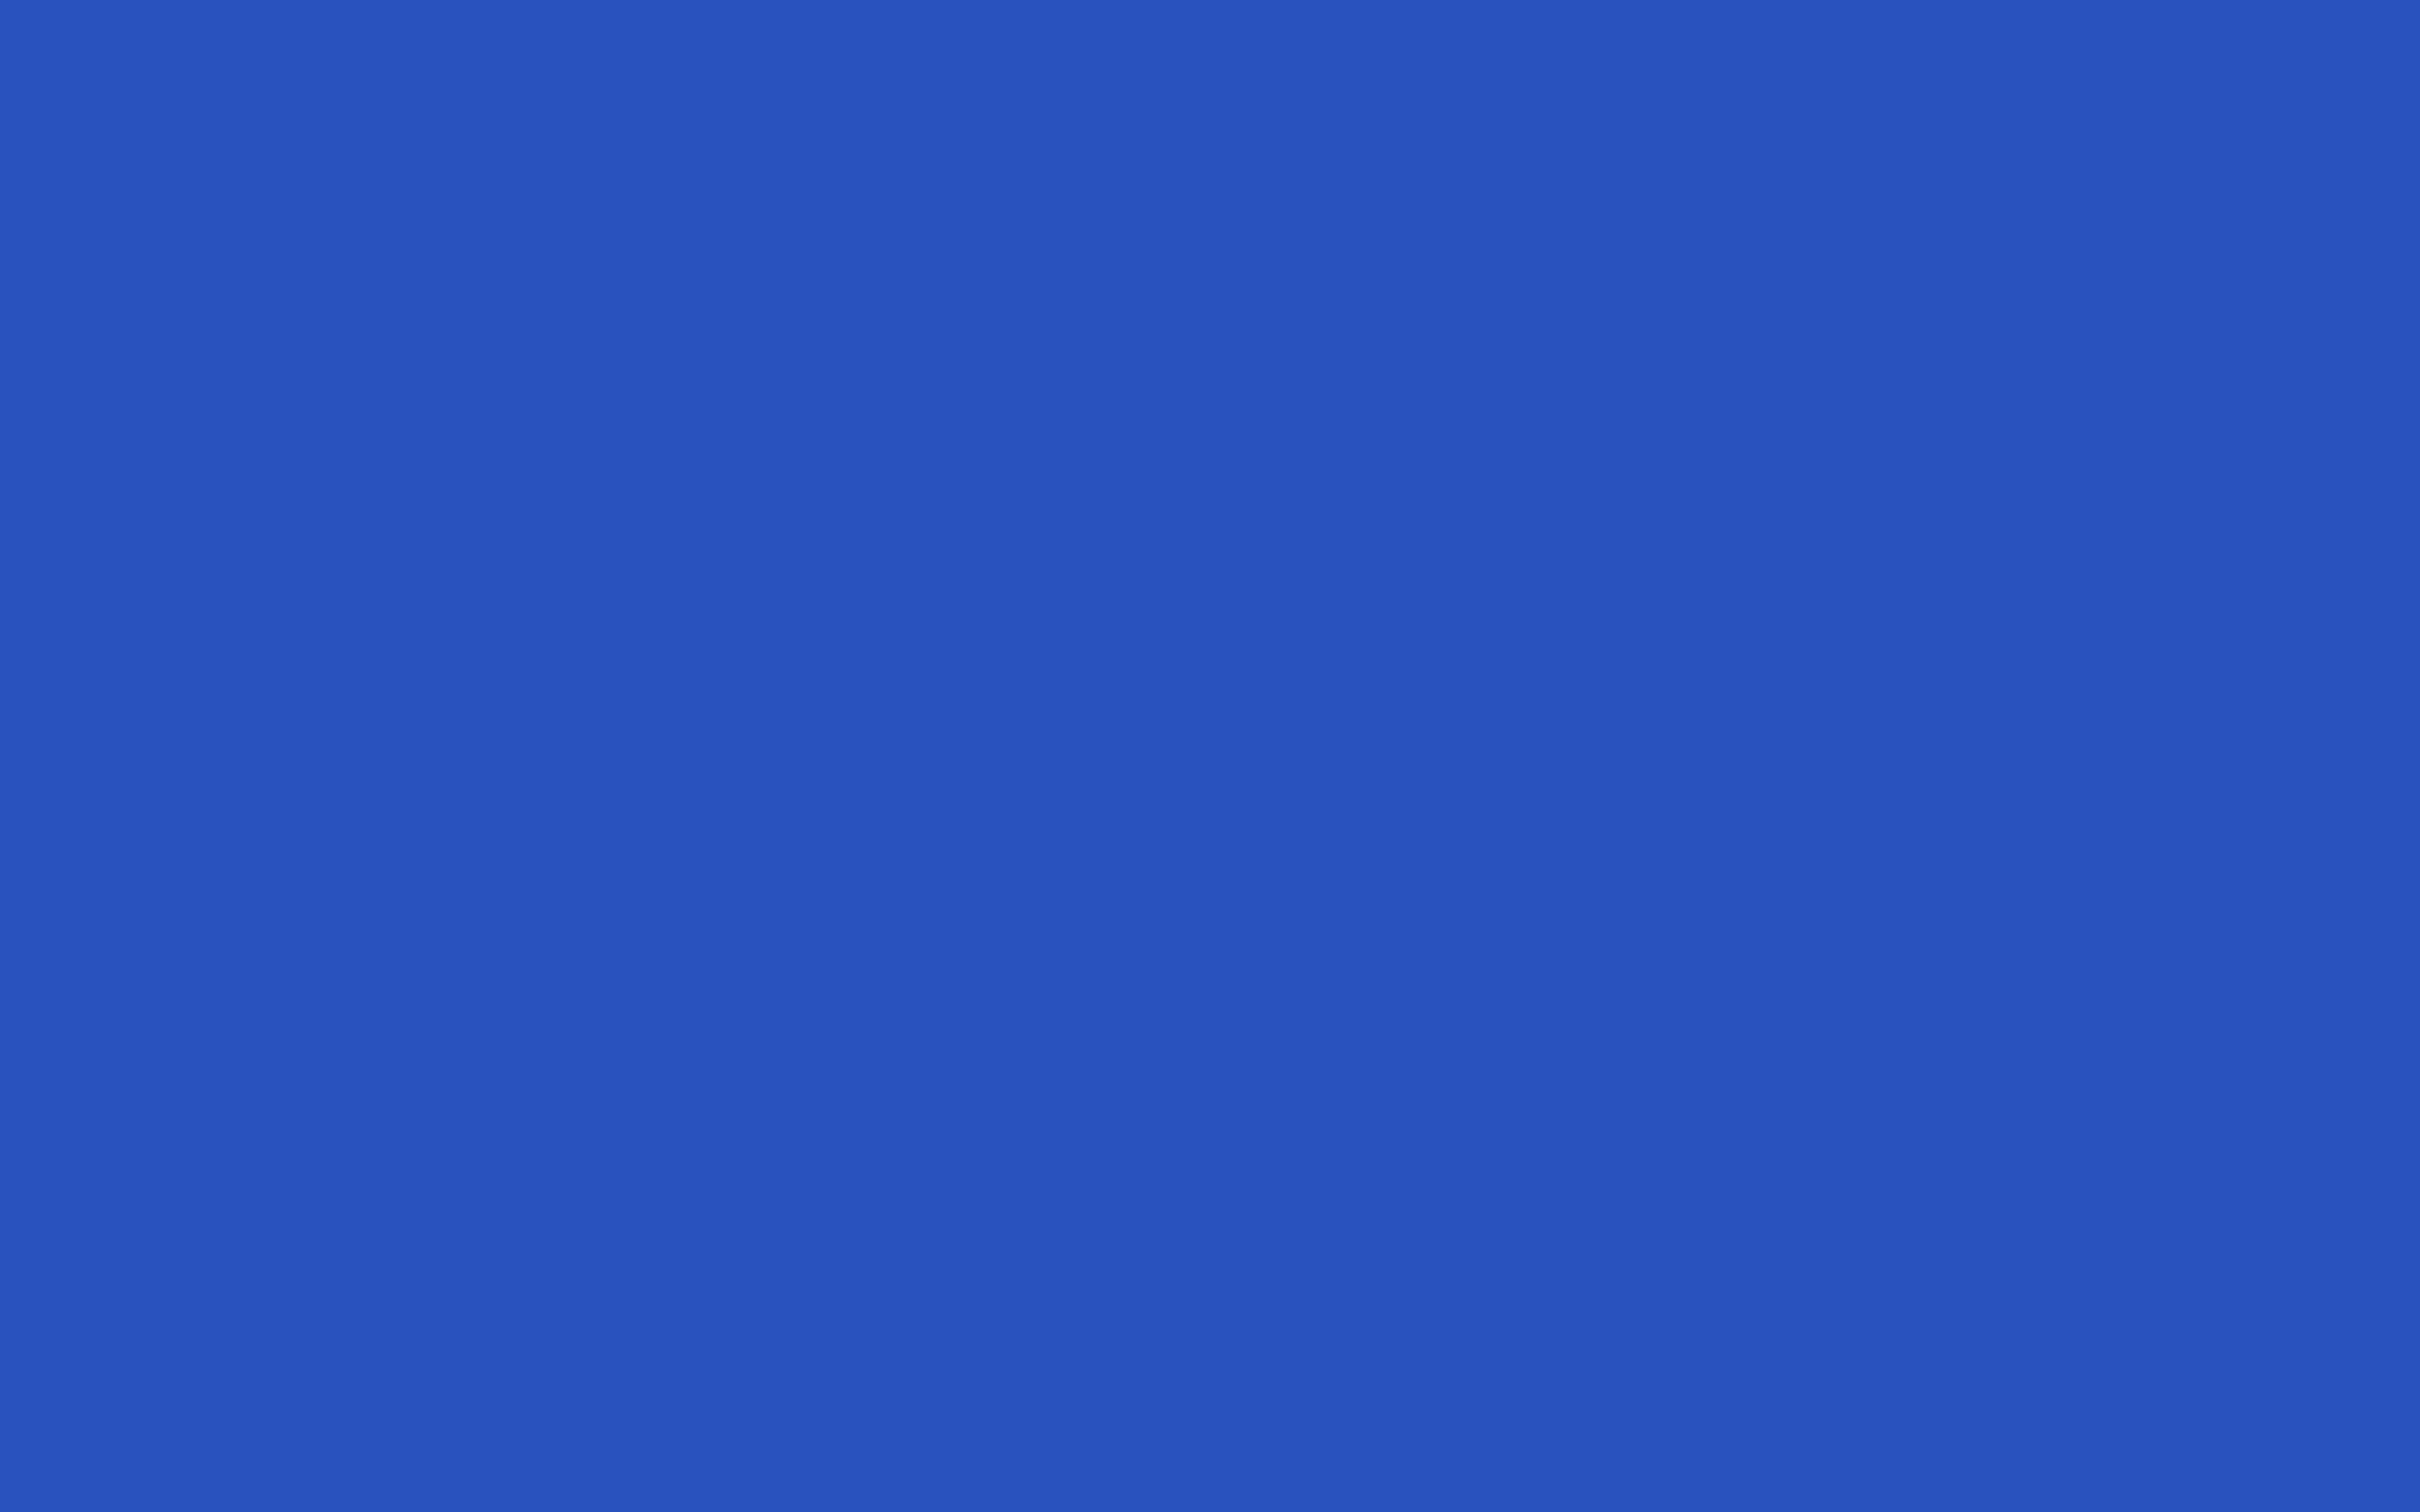 2560x1600 Cerulean Blue Solid Color Background